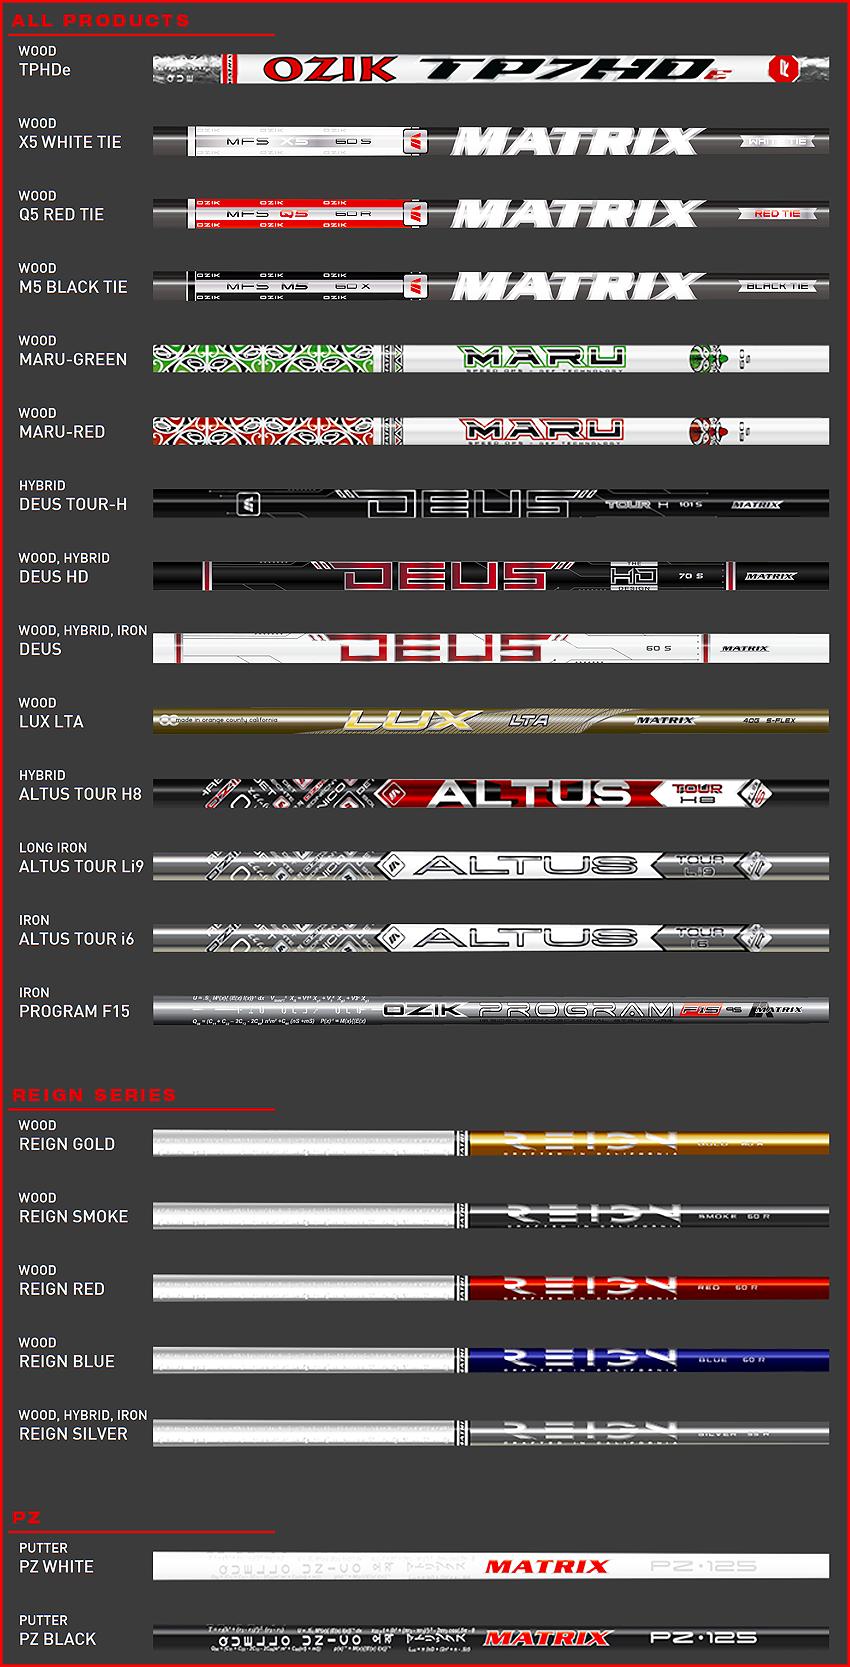 Matrix 2018 shafts